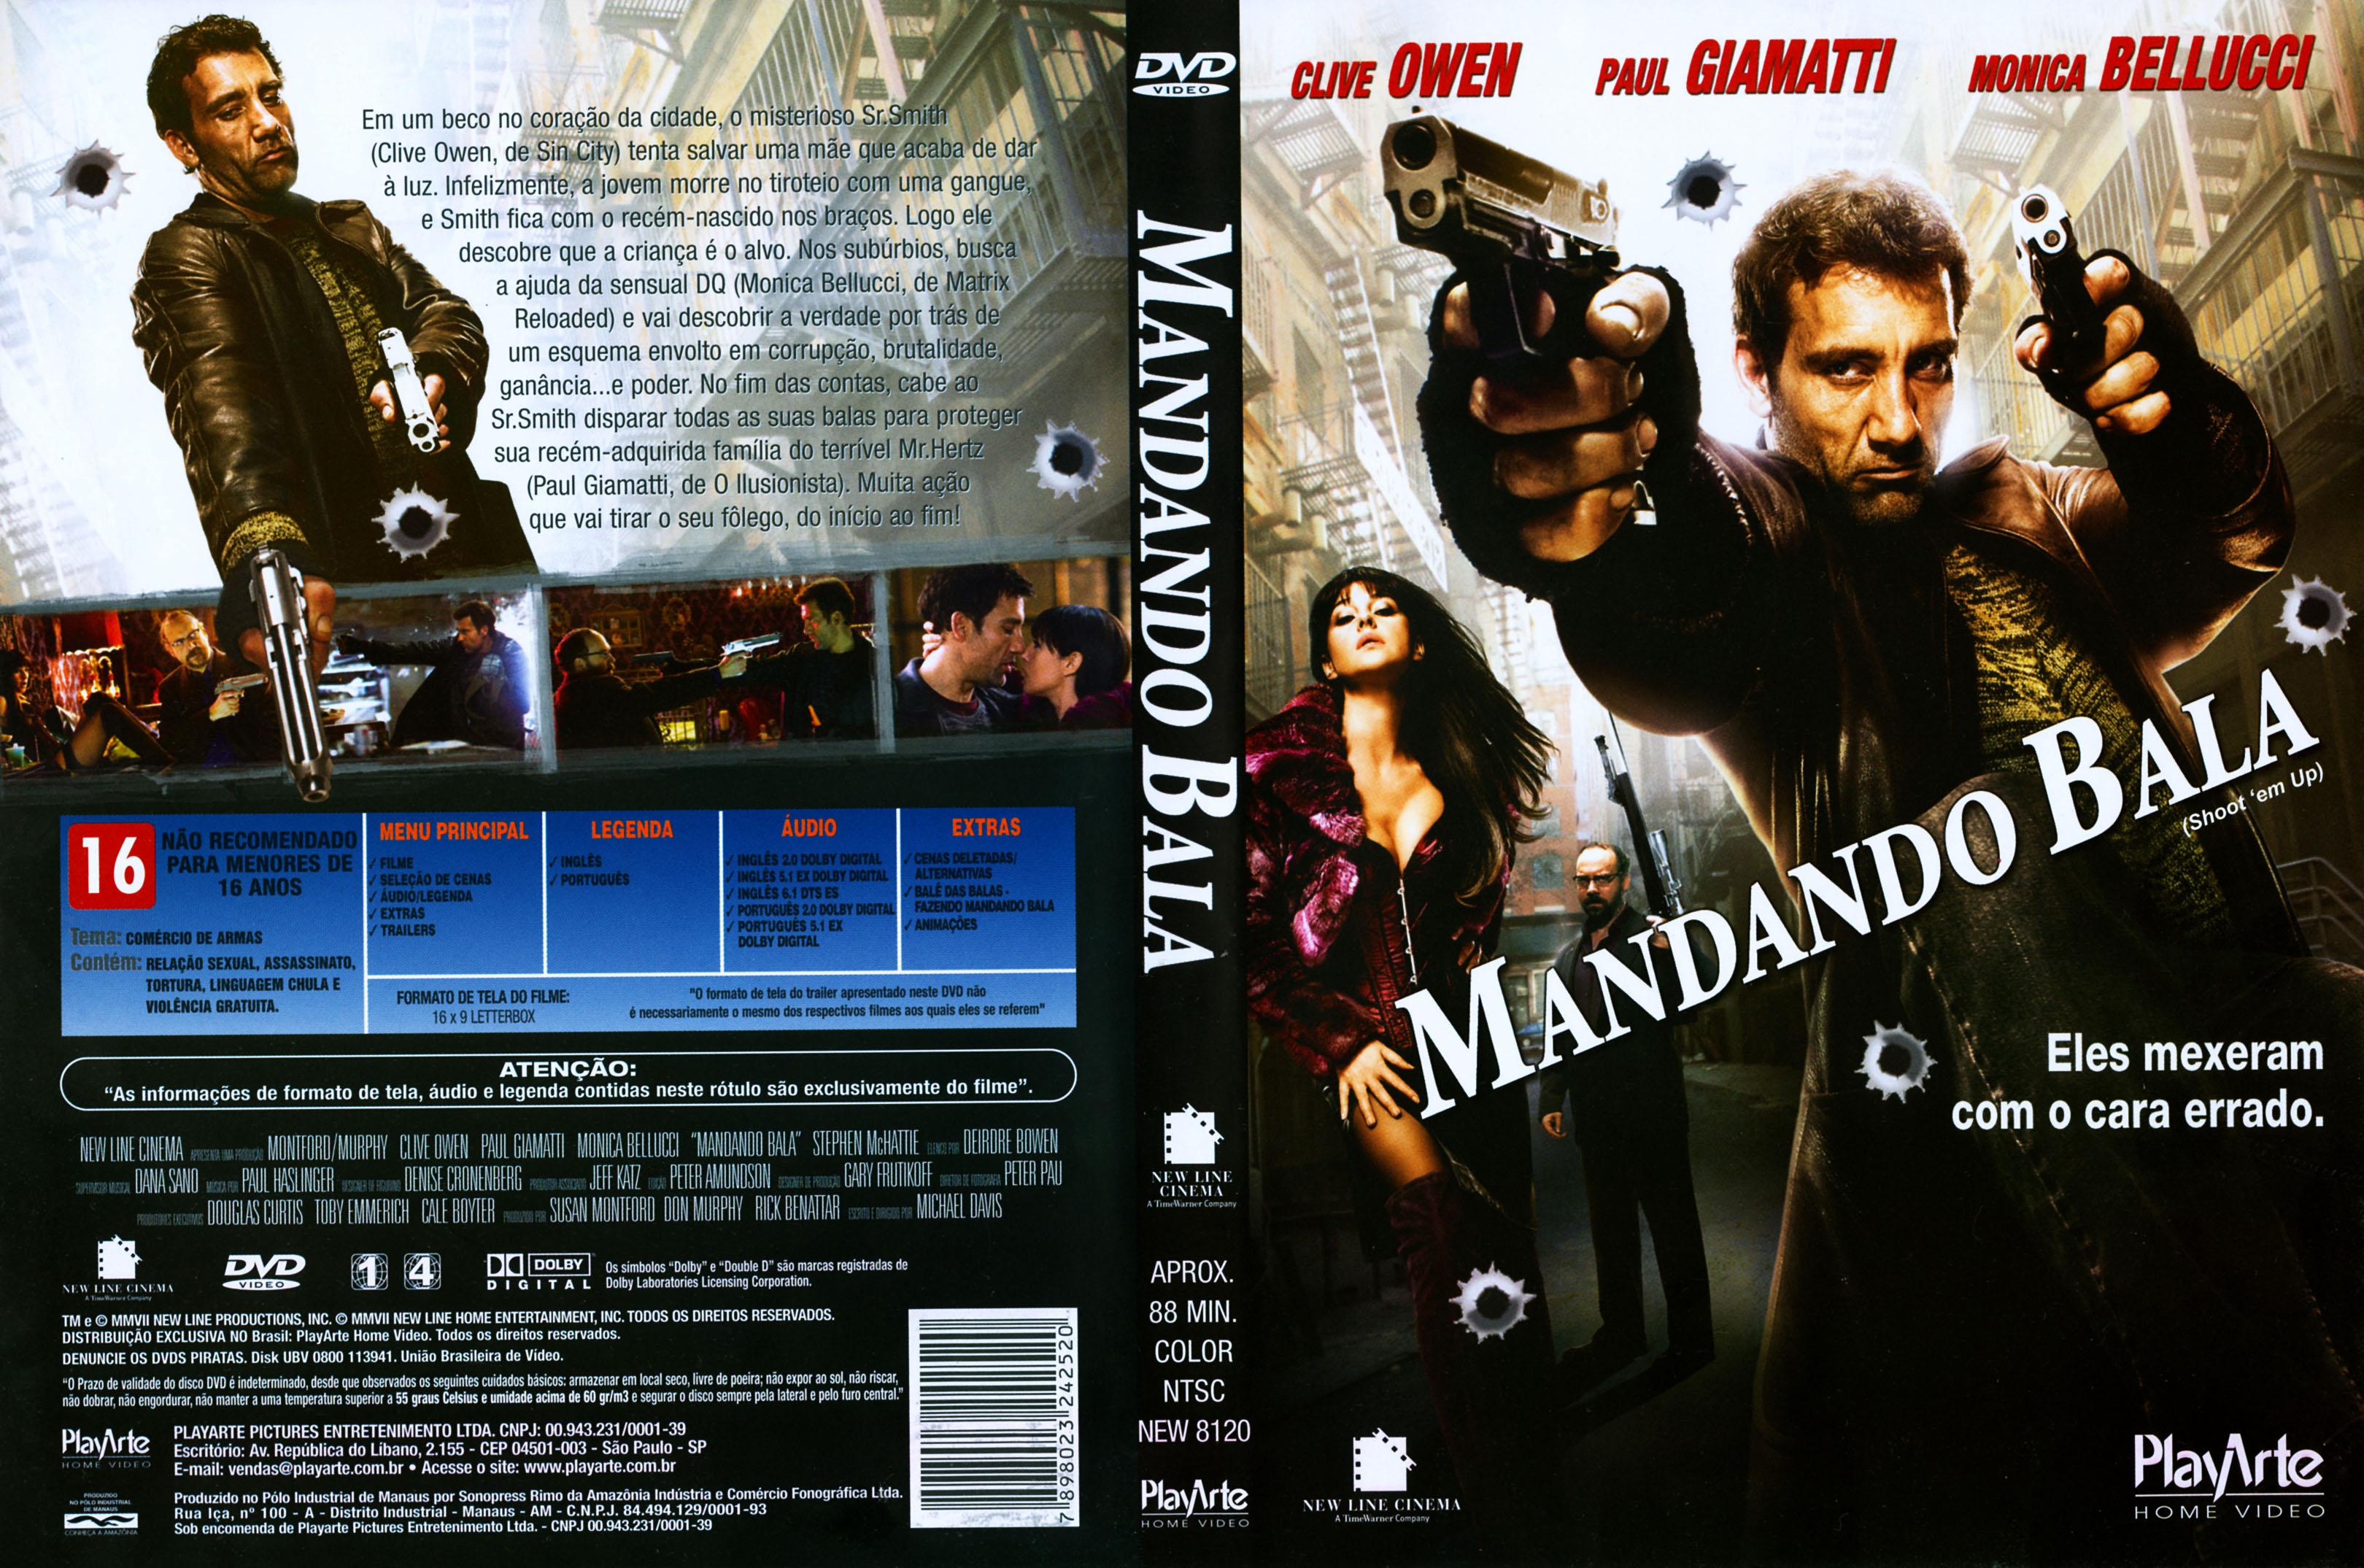 MandandoBala